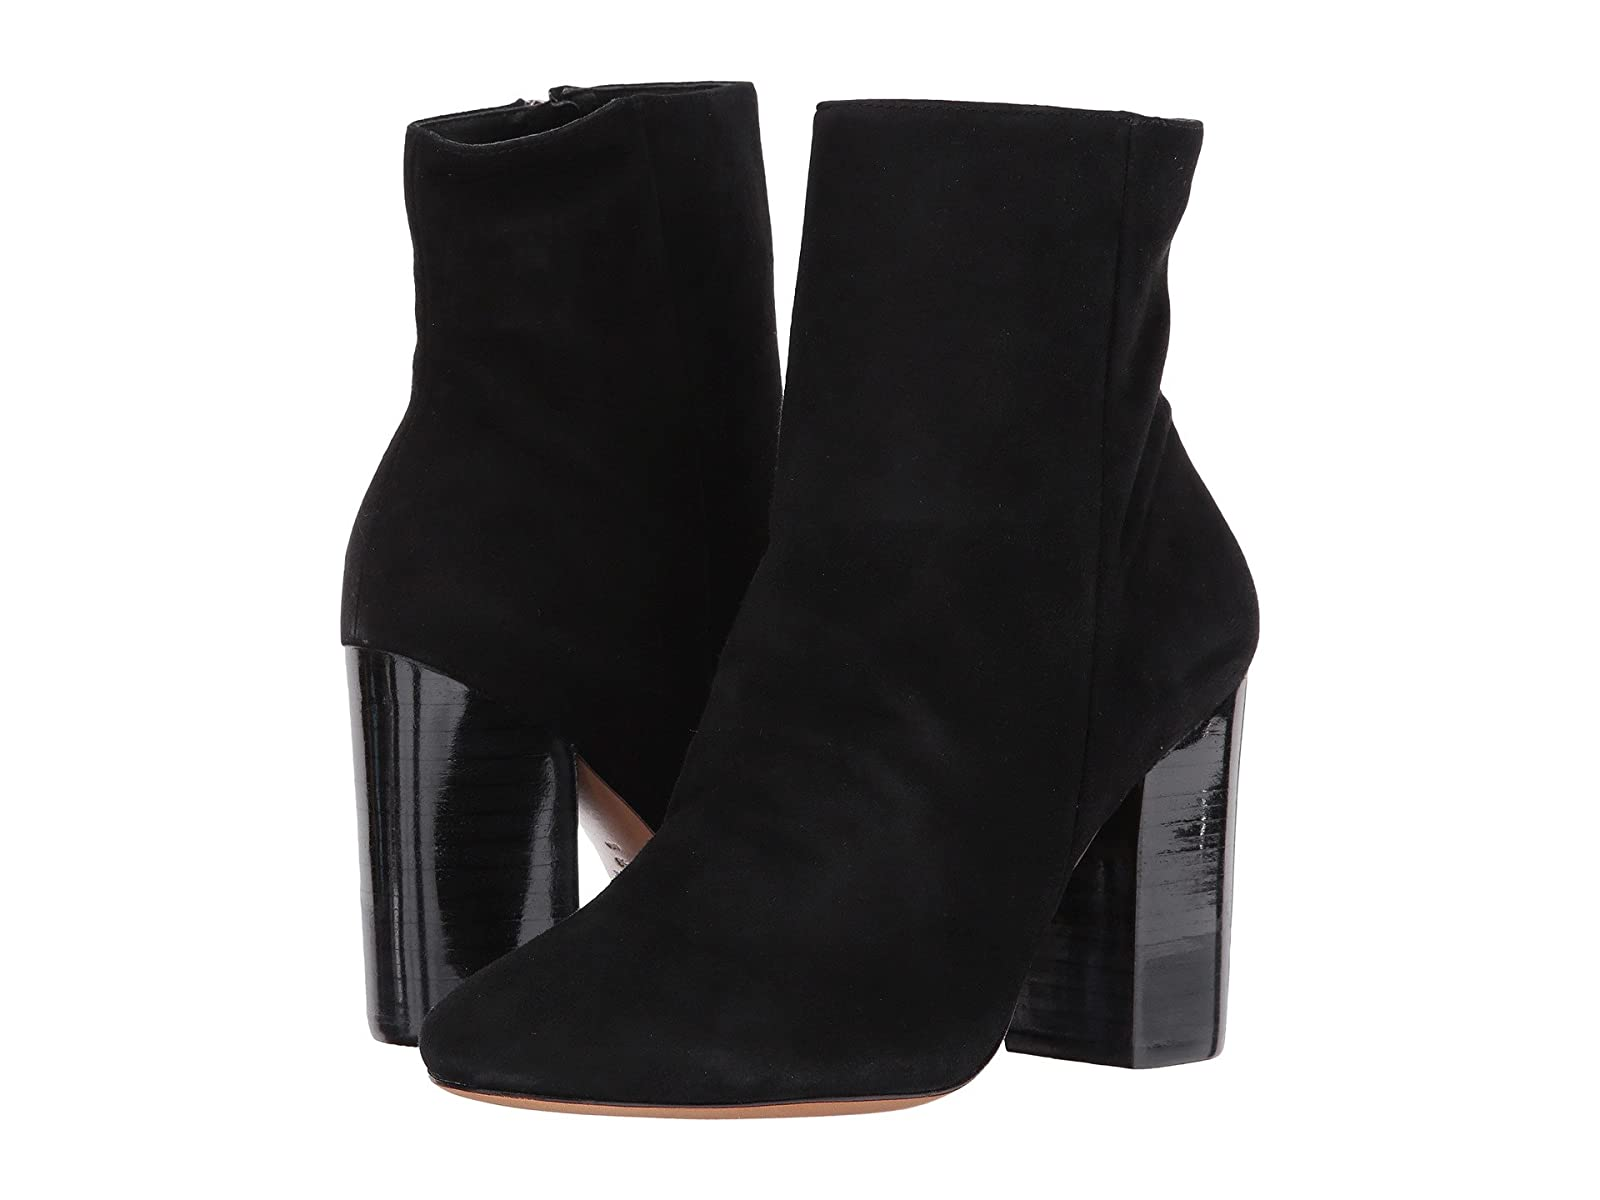 Schutz RavanCheap and distinctive eye-catching shoes